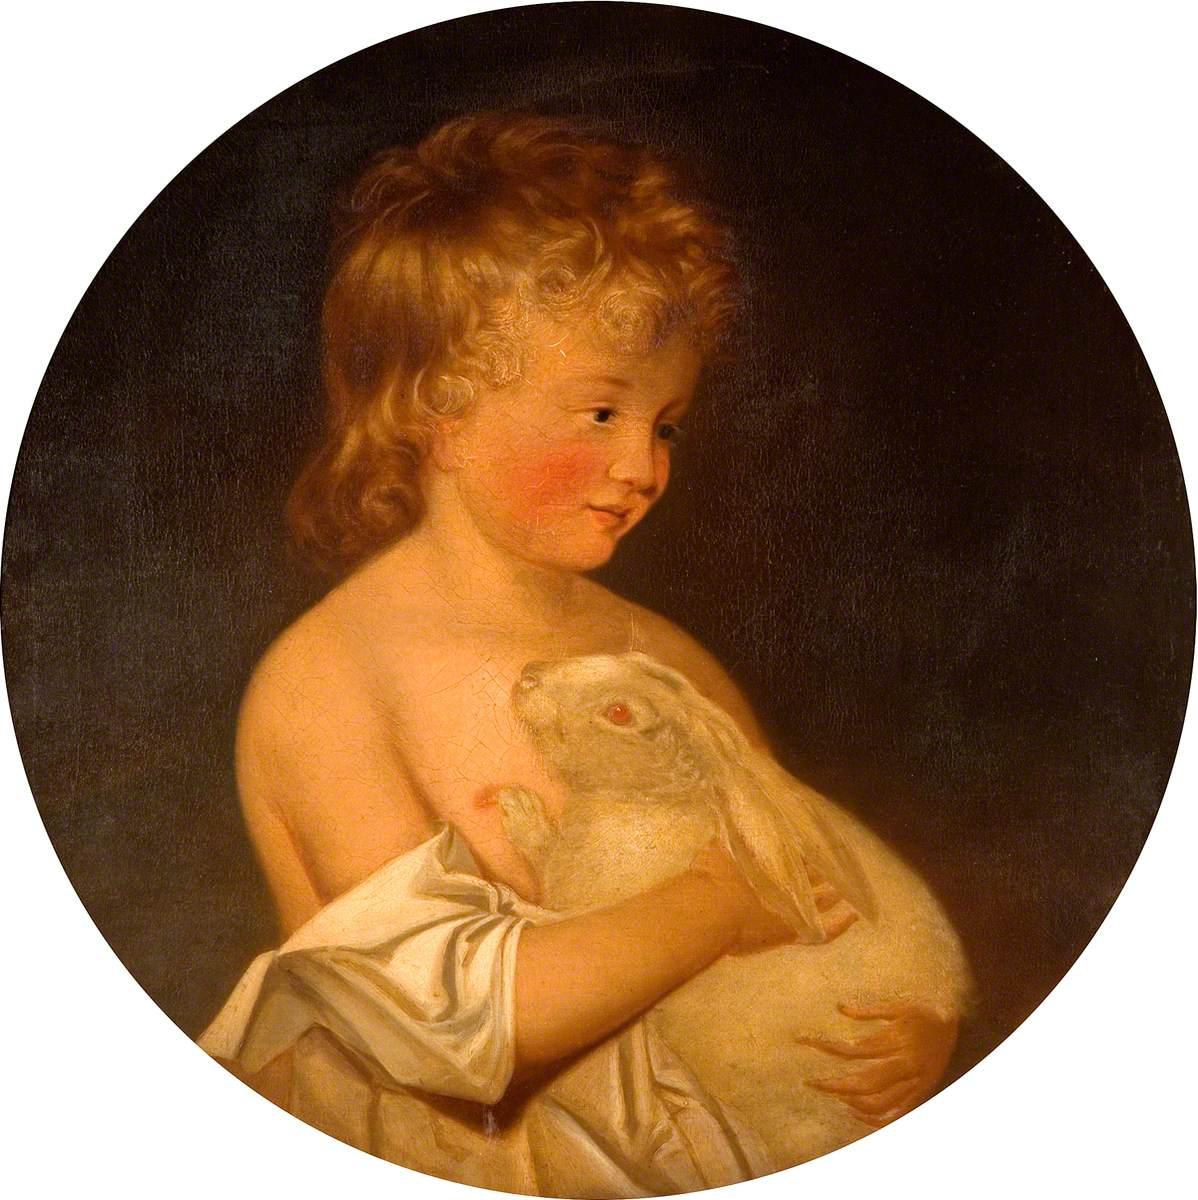 Boy with Rabbit